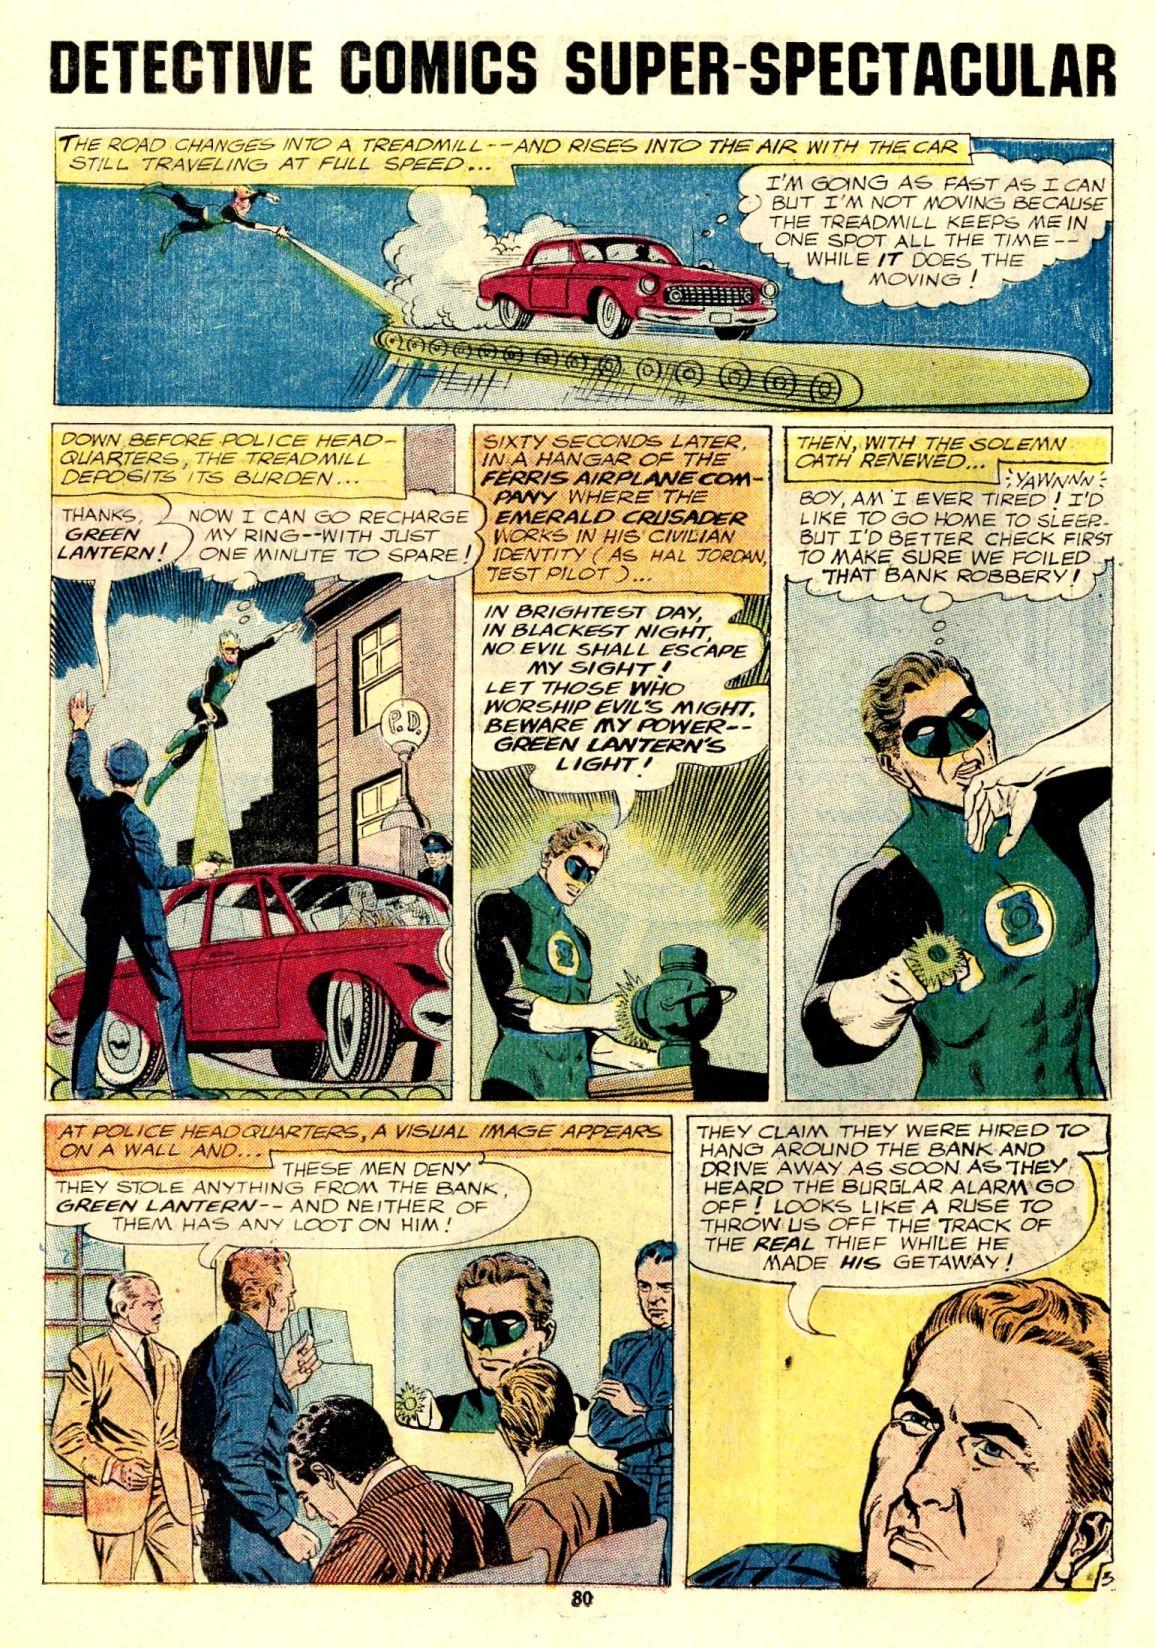 Detective Comics (1937) 438 Page 80